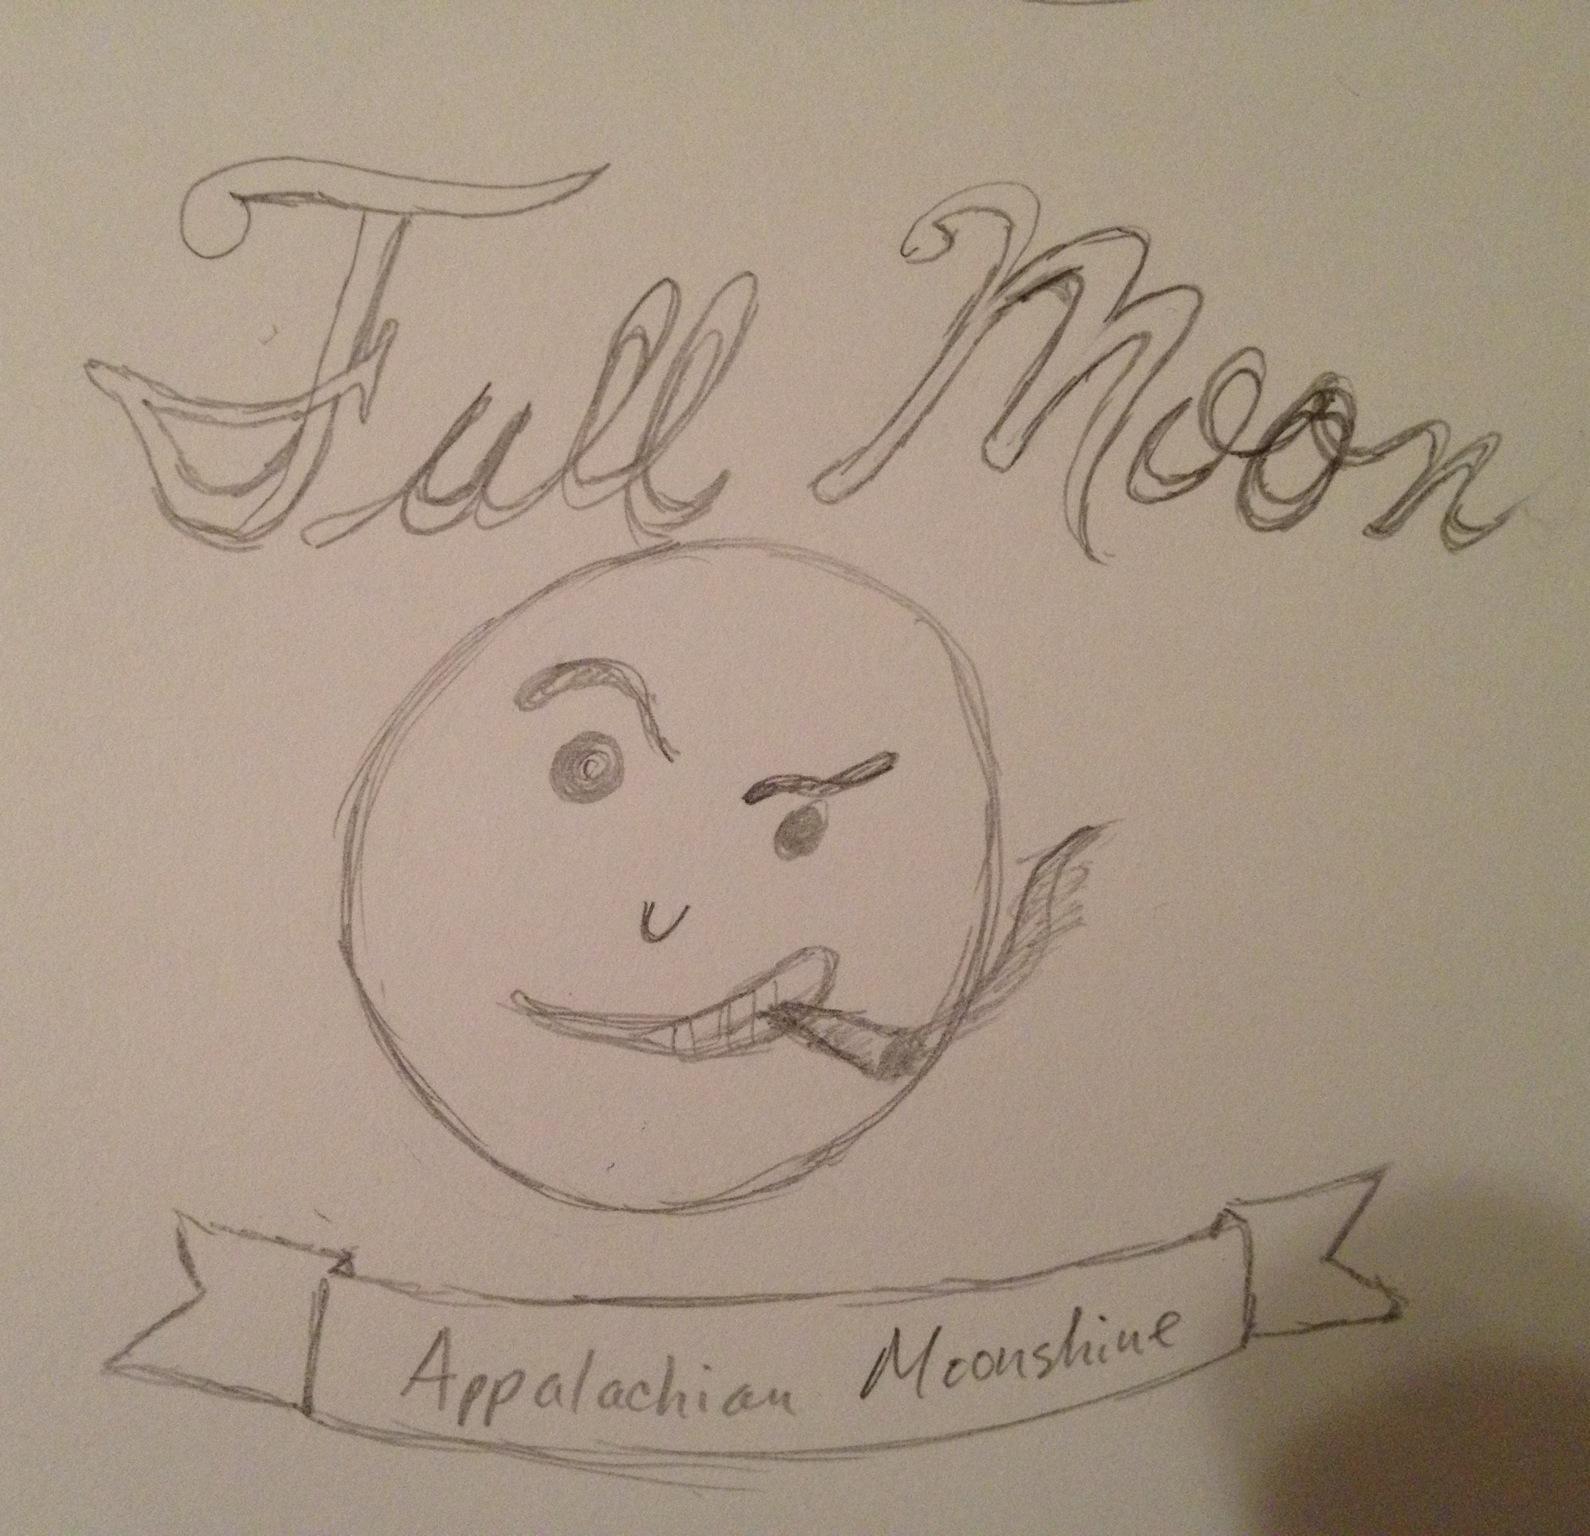 Full Moon Appalachian Moonshine - image 7 - student project